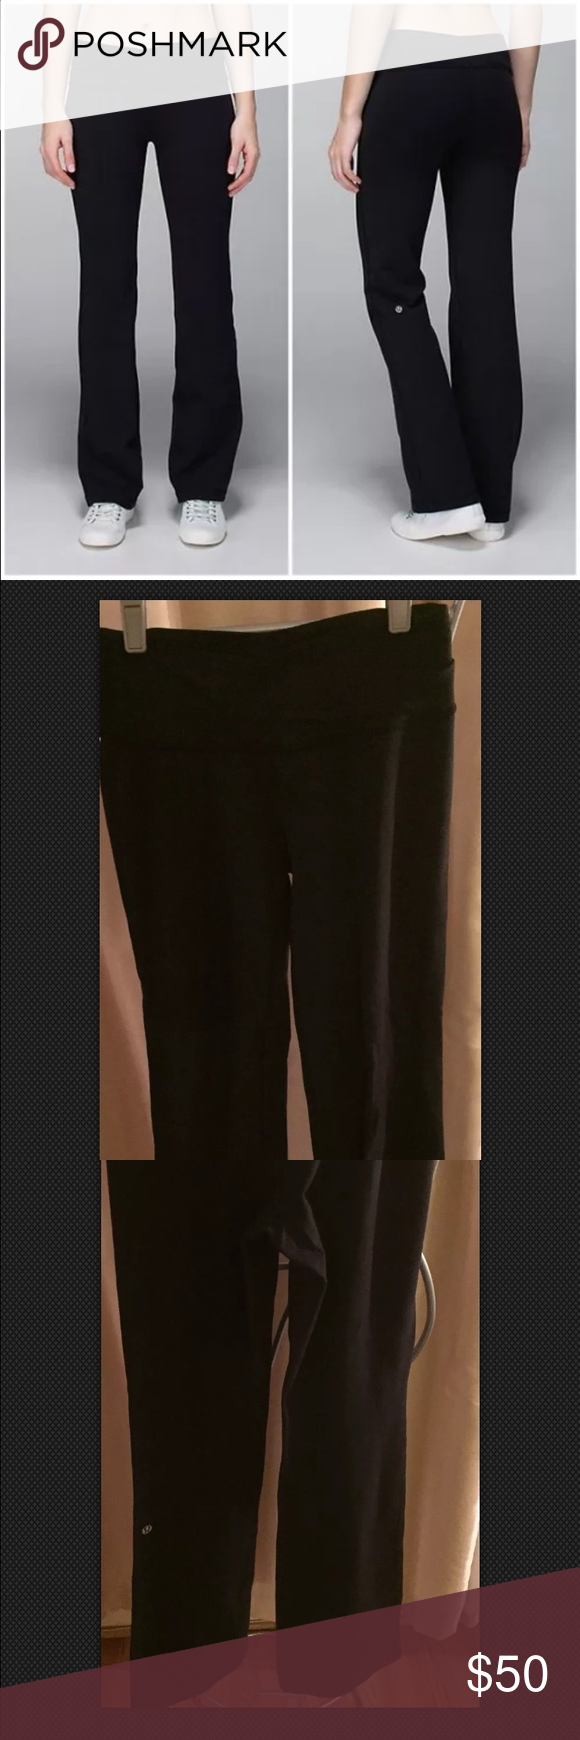 lululemon astro wunder under pants pinterest lululemon